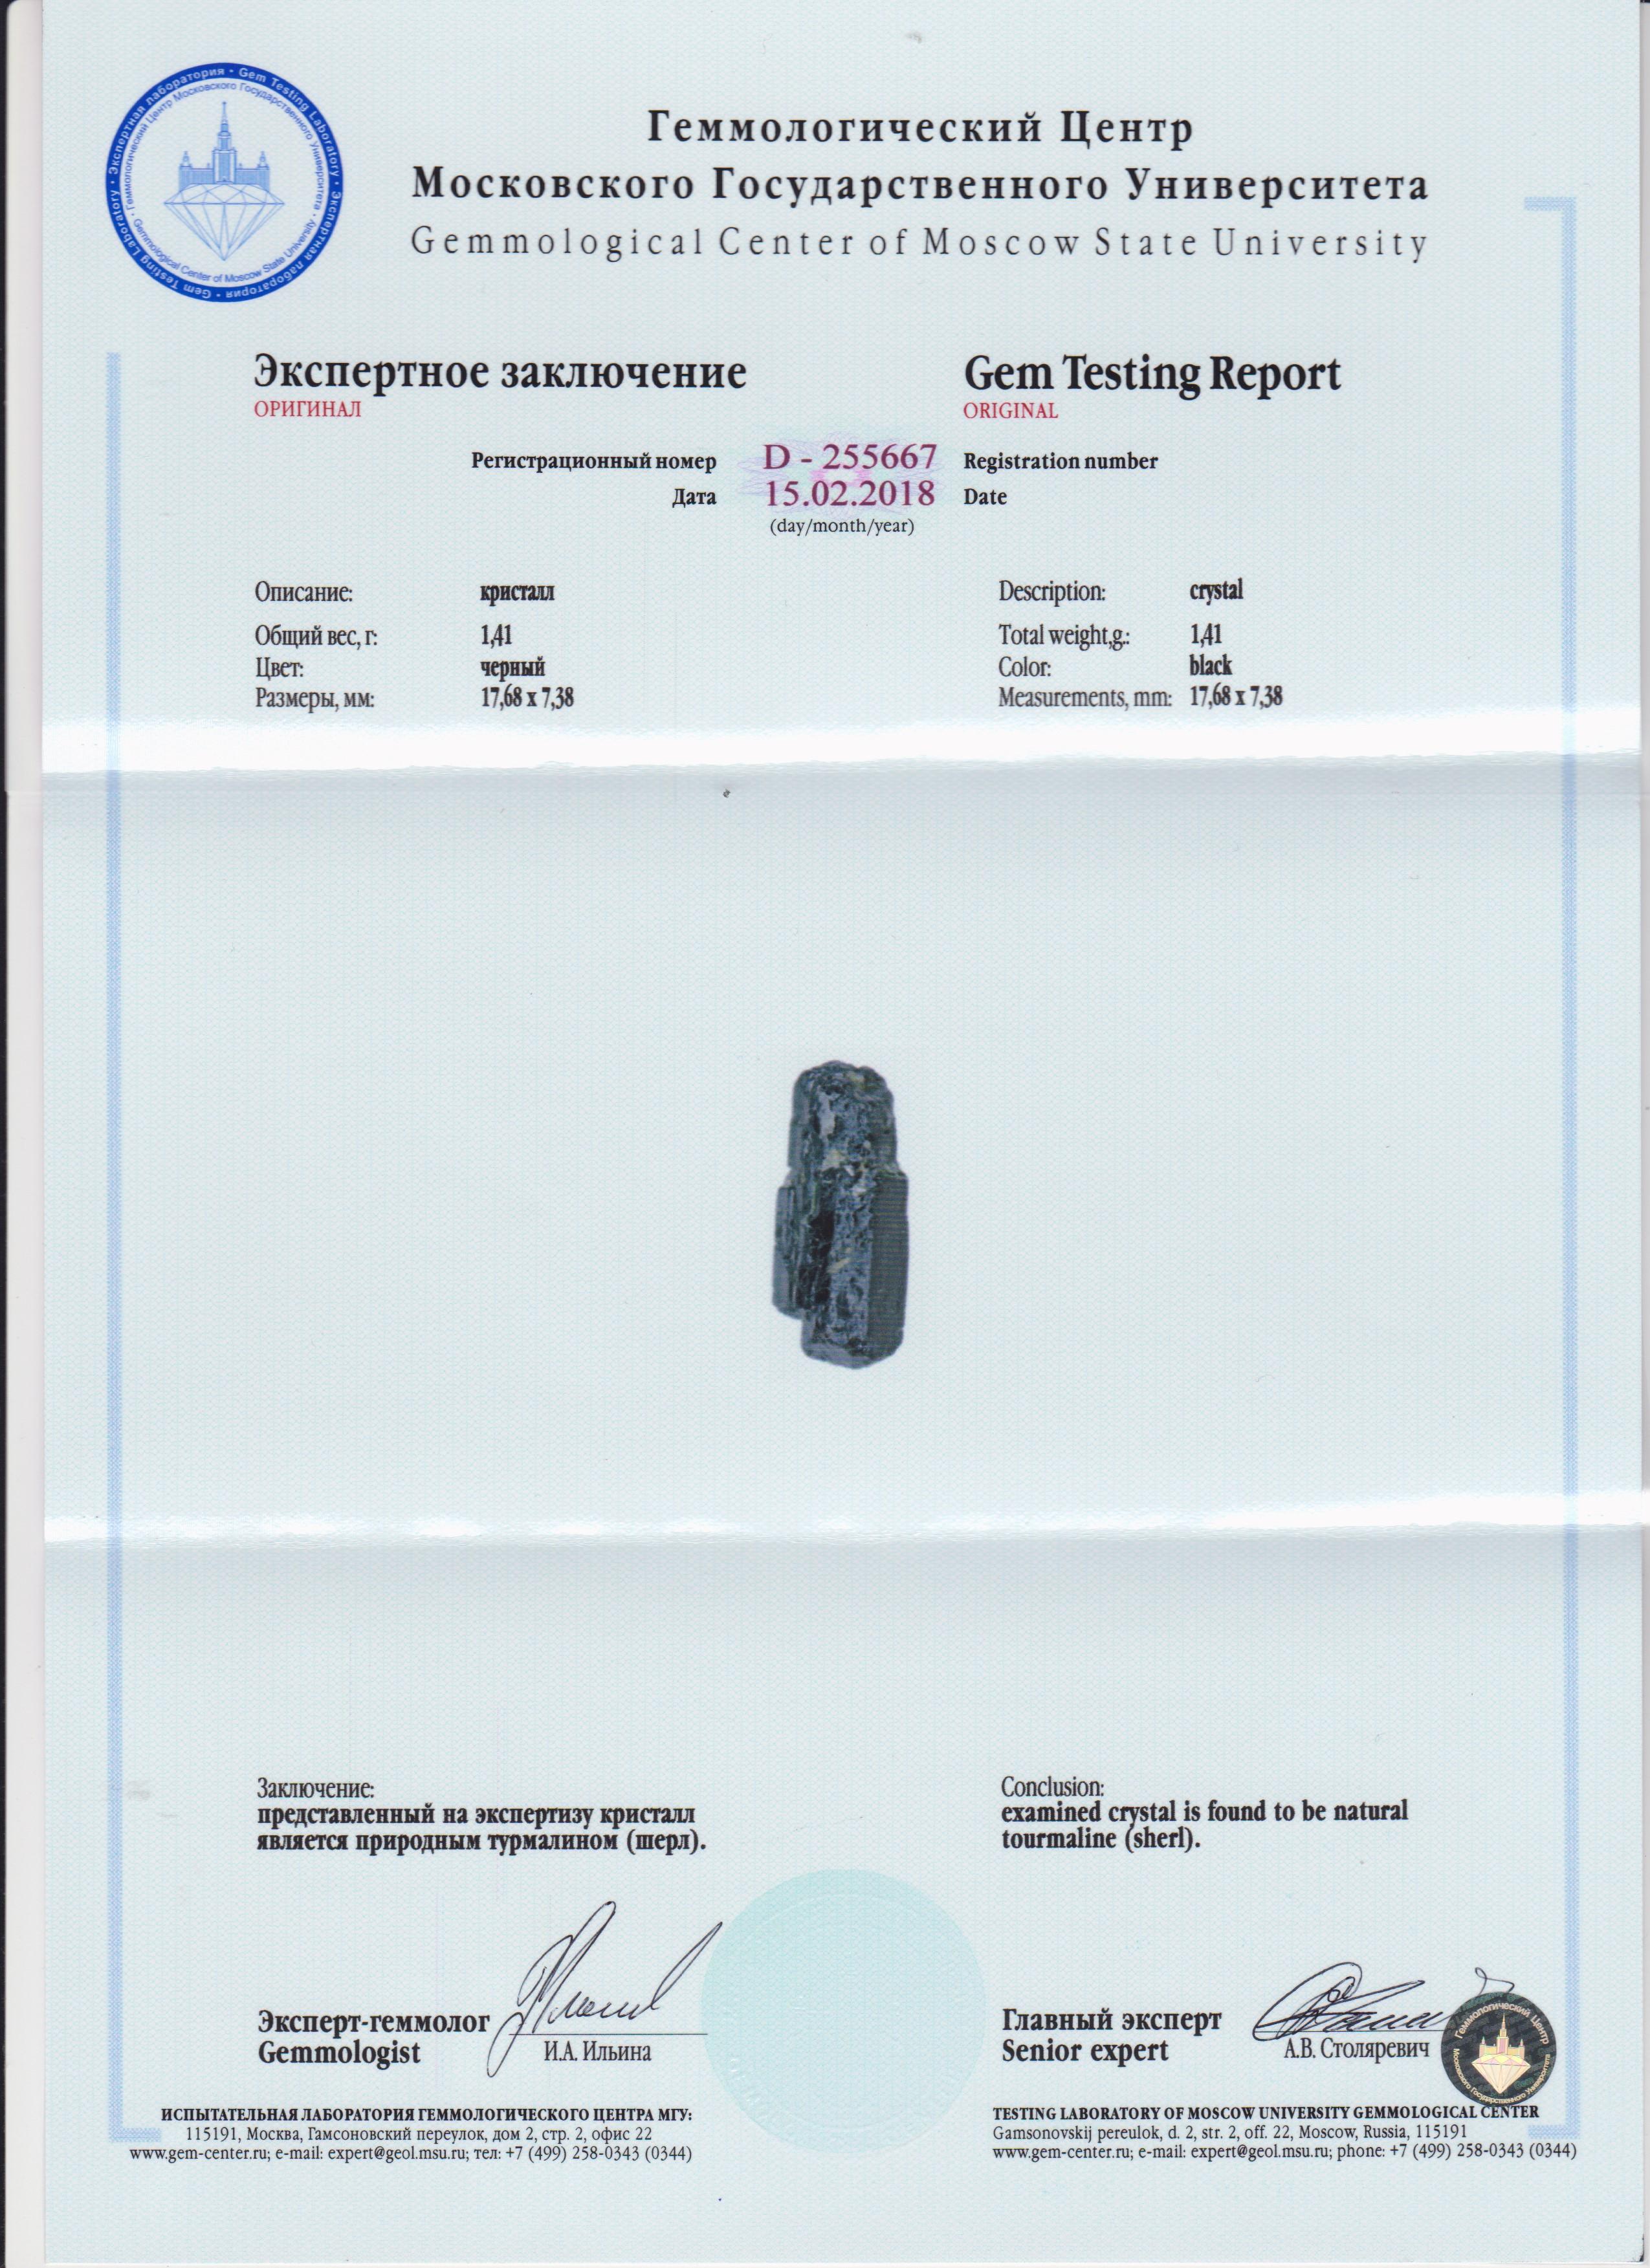 https://mineralmarket.ru/img/certificate/123/1520250299.jpg